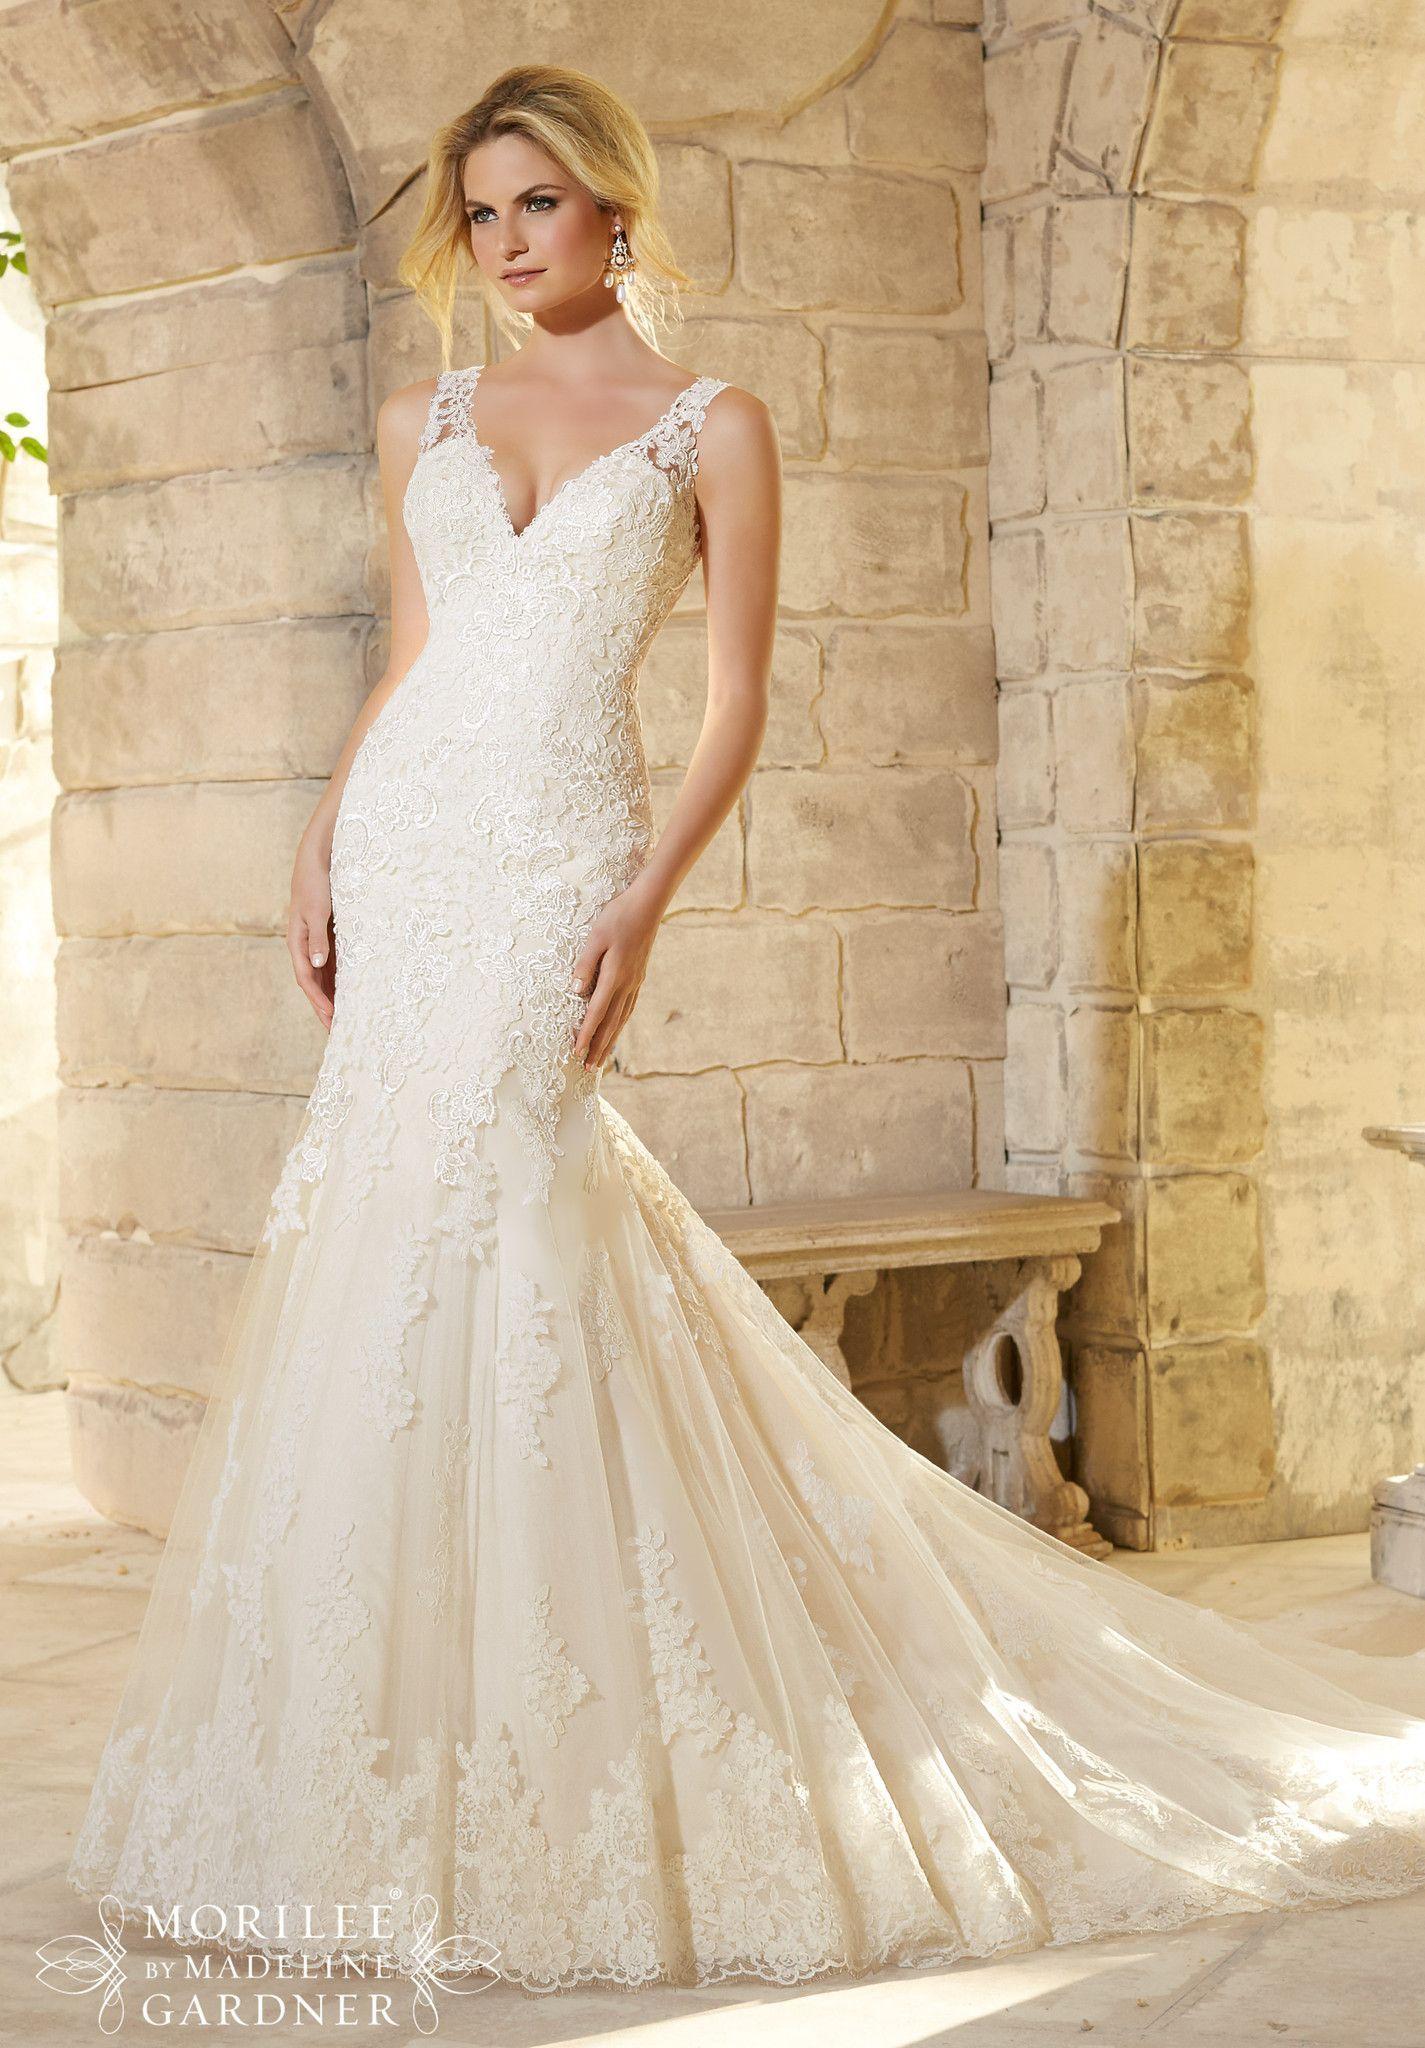 Mori Lee - 2773 - All Dressed Up, Bridal Gown   Boda, Vestidos de ...